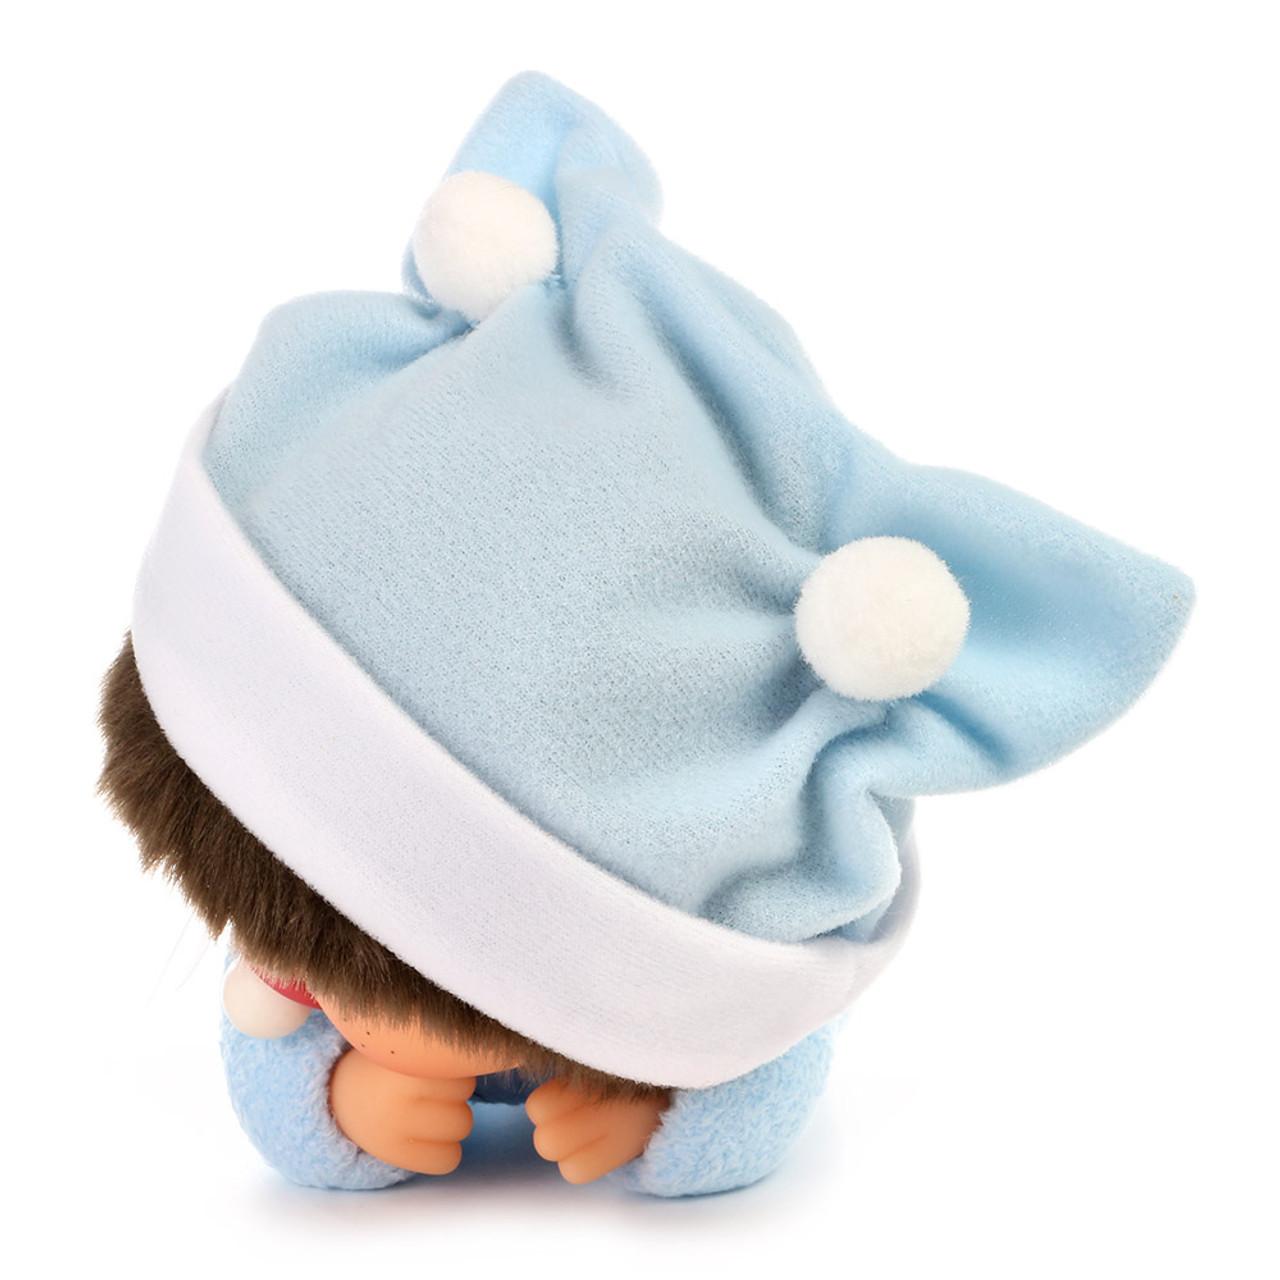 Sekiguchi Bebichhichi Monkey Boy Baby Blue Shirt Crawling Plush Doll - Medium ( Feature 01 )